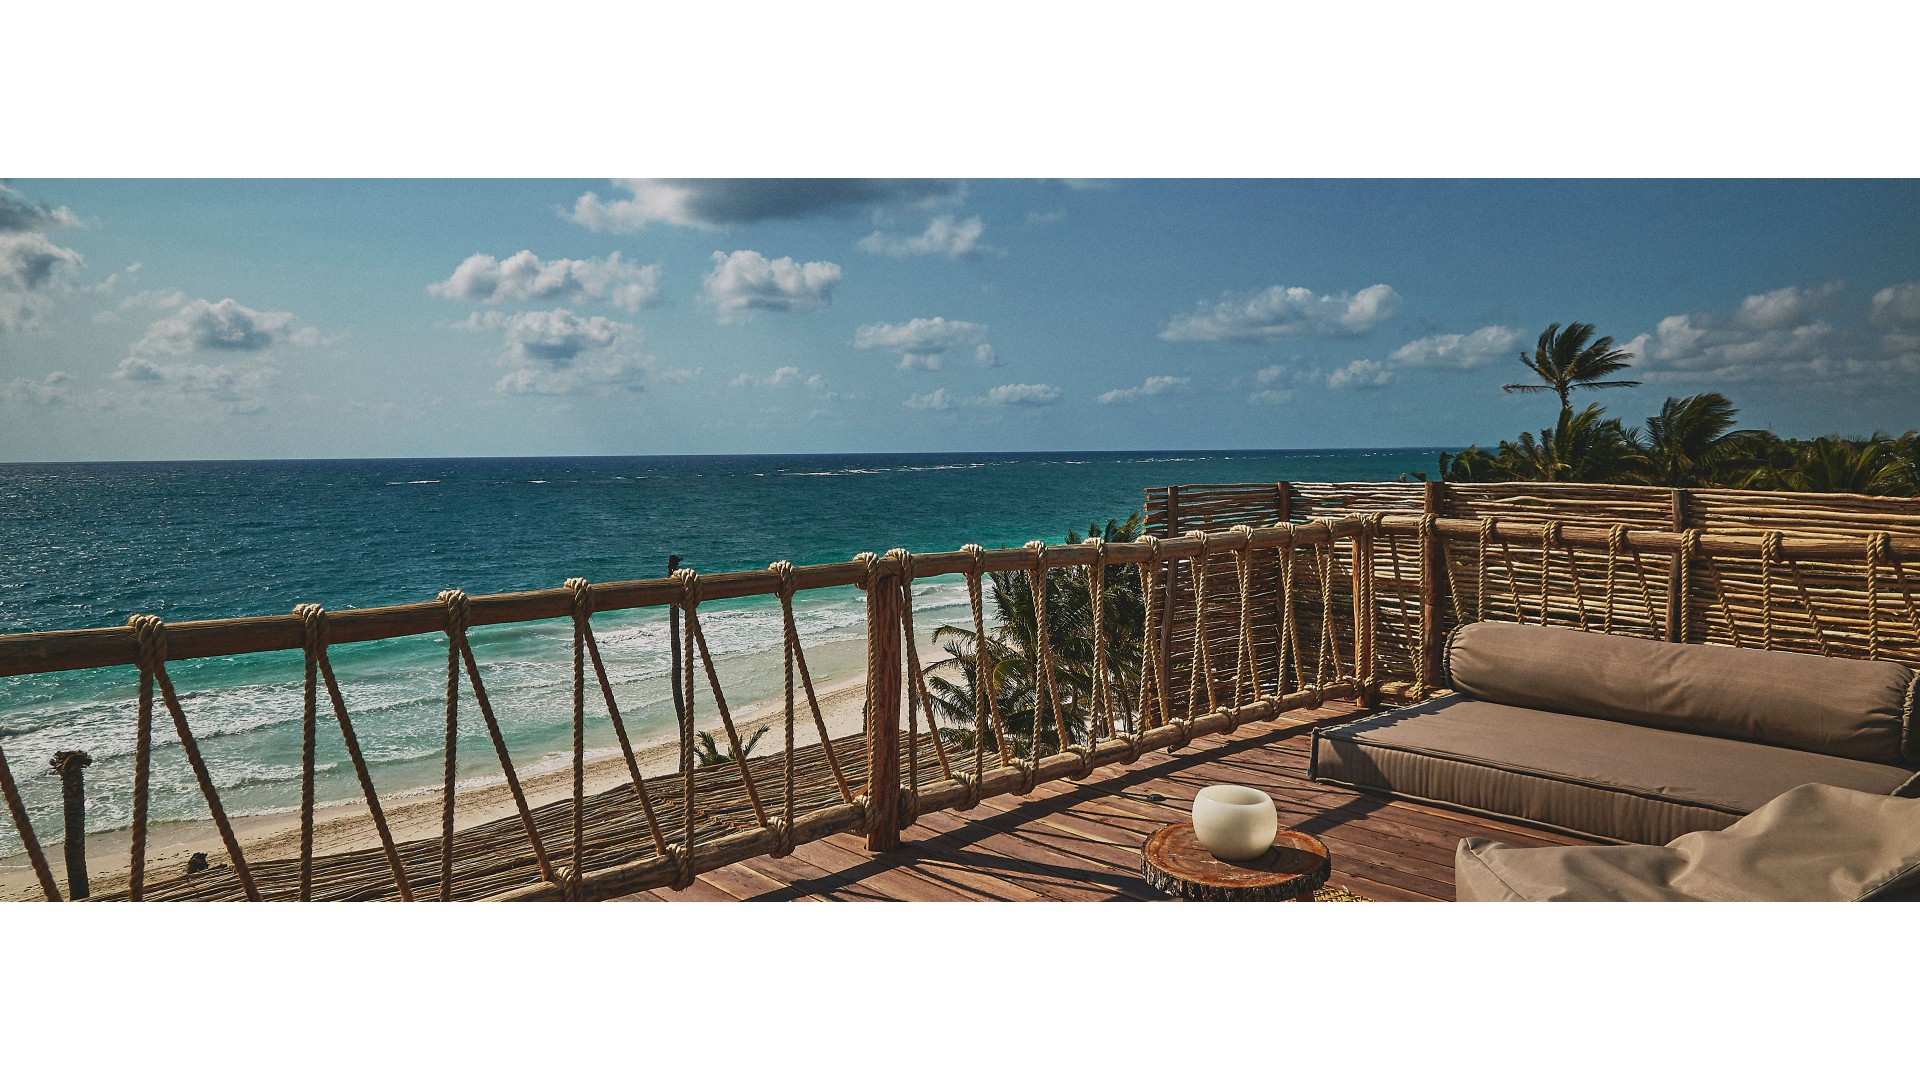 Nomade Tulum Hotel Tulum Quintana Roo Smith Hotels